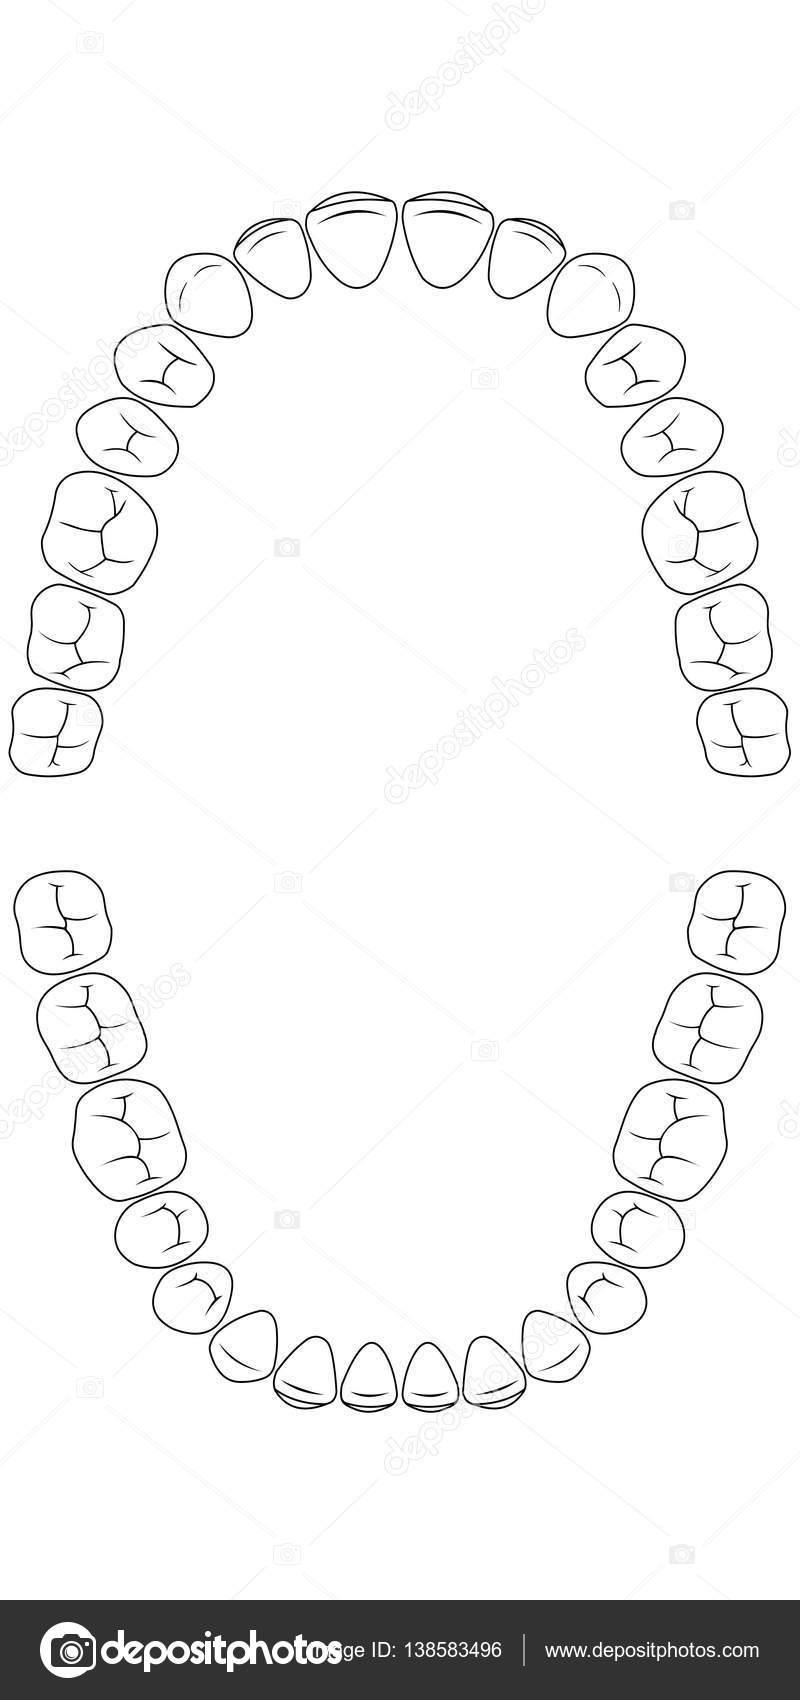 Teeth Charts  BesikEightyCo